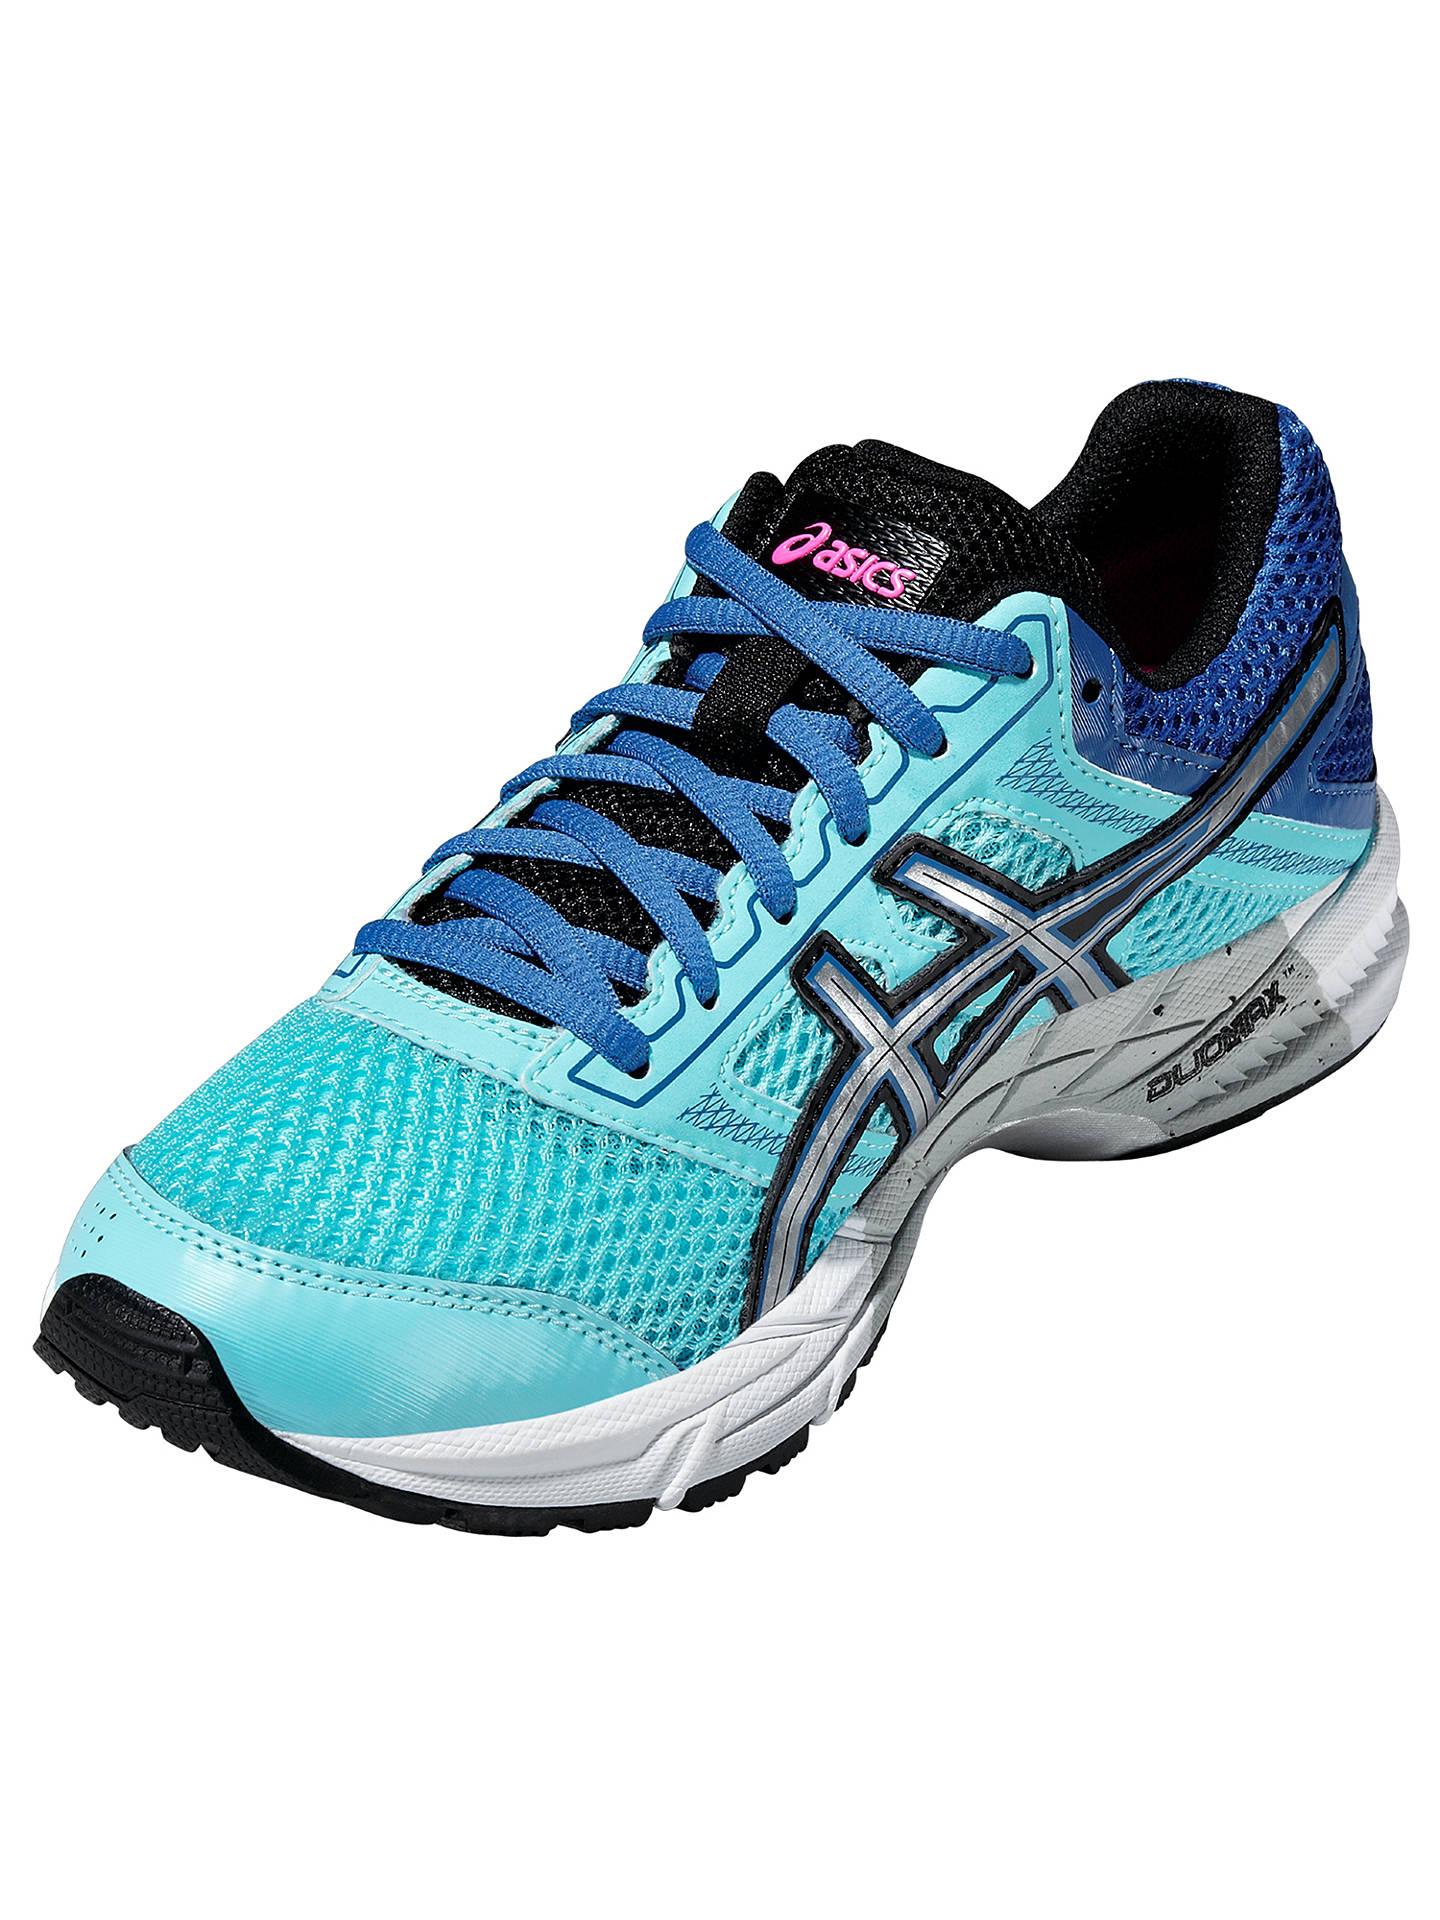 duża zniżka wiele kolorów unikalny design Asics GEL-TROUNCE 3 Women's Running Shoes, Turquoise/Silver ...